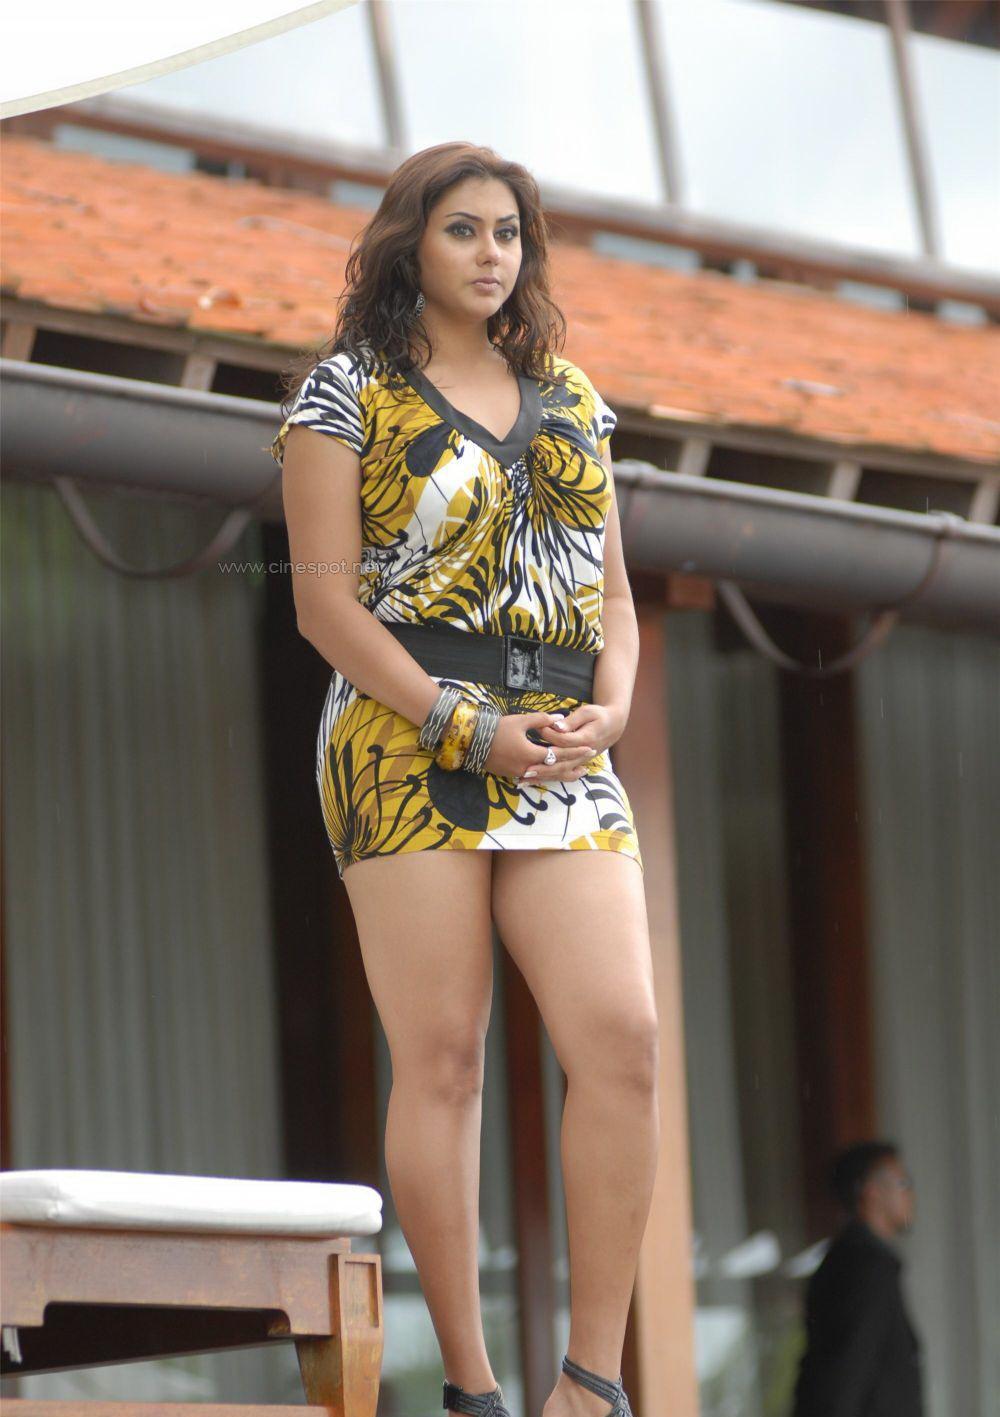 namitha actress and tamil model sexy short dress images